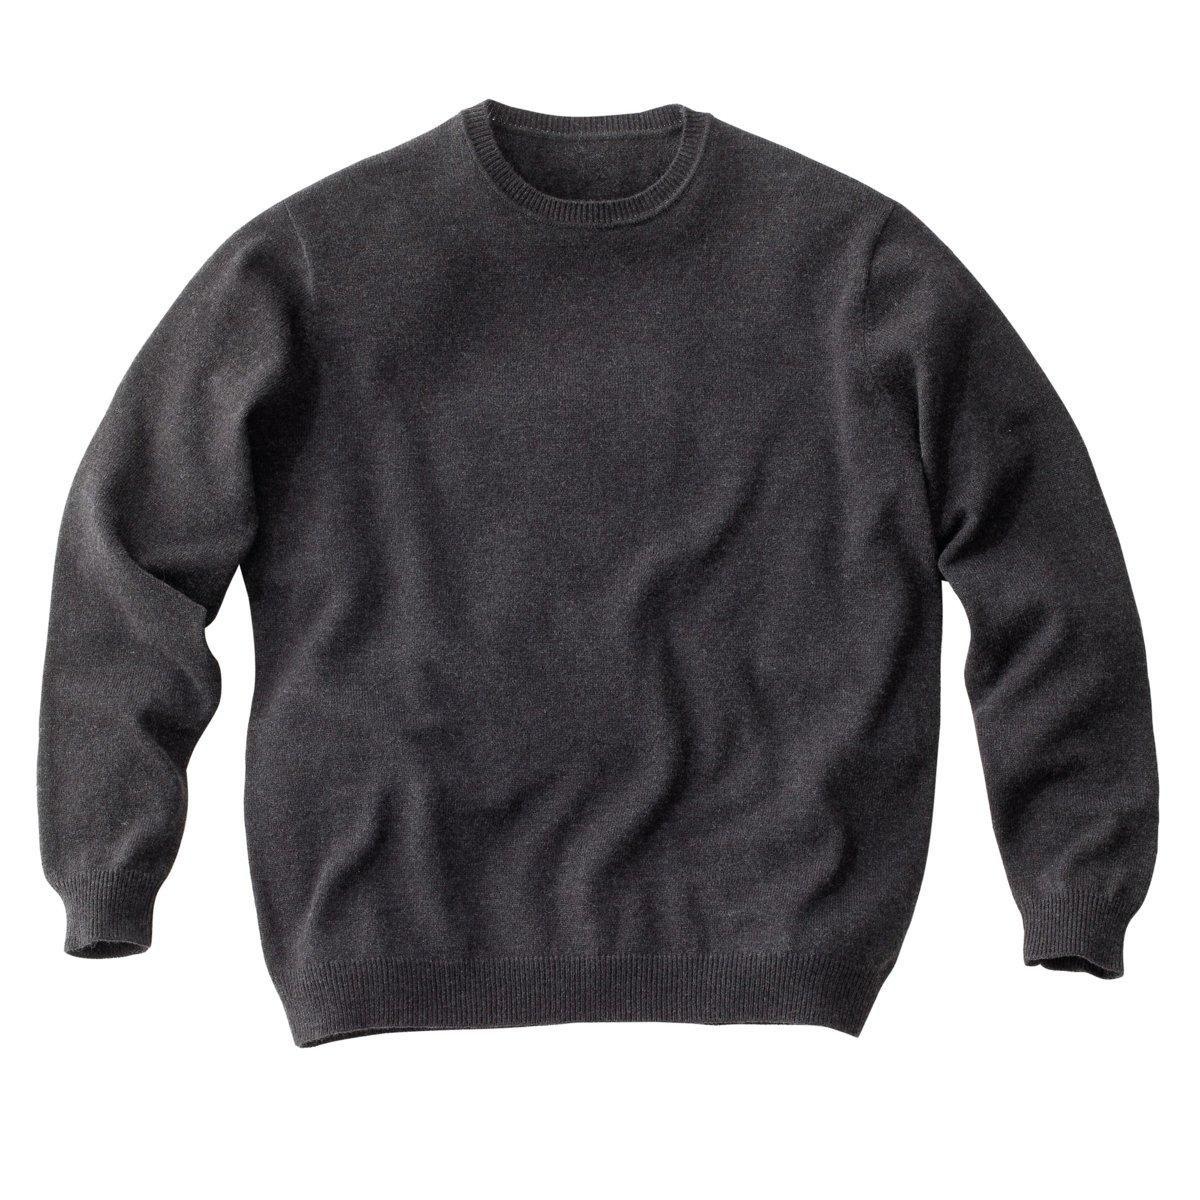 Пуловер, 50% шерсти